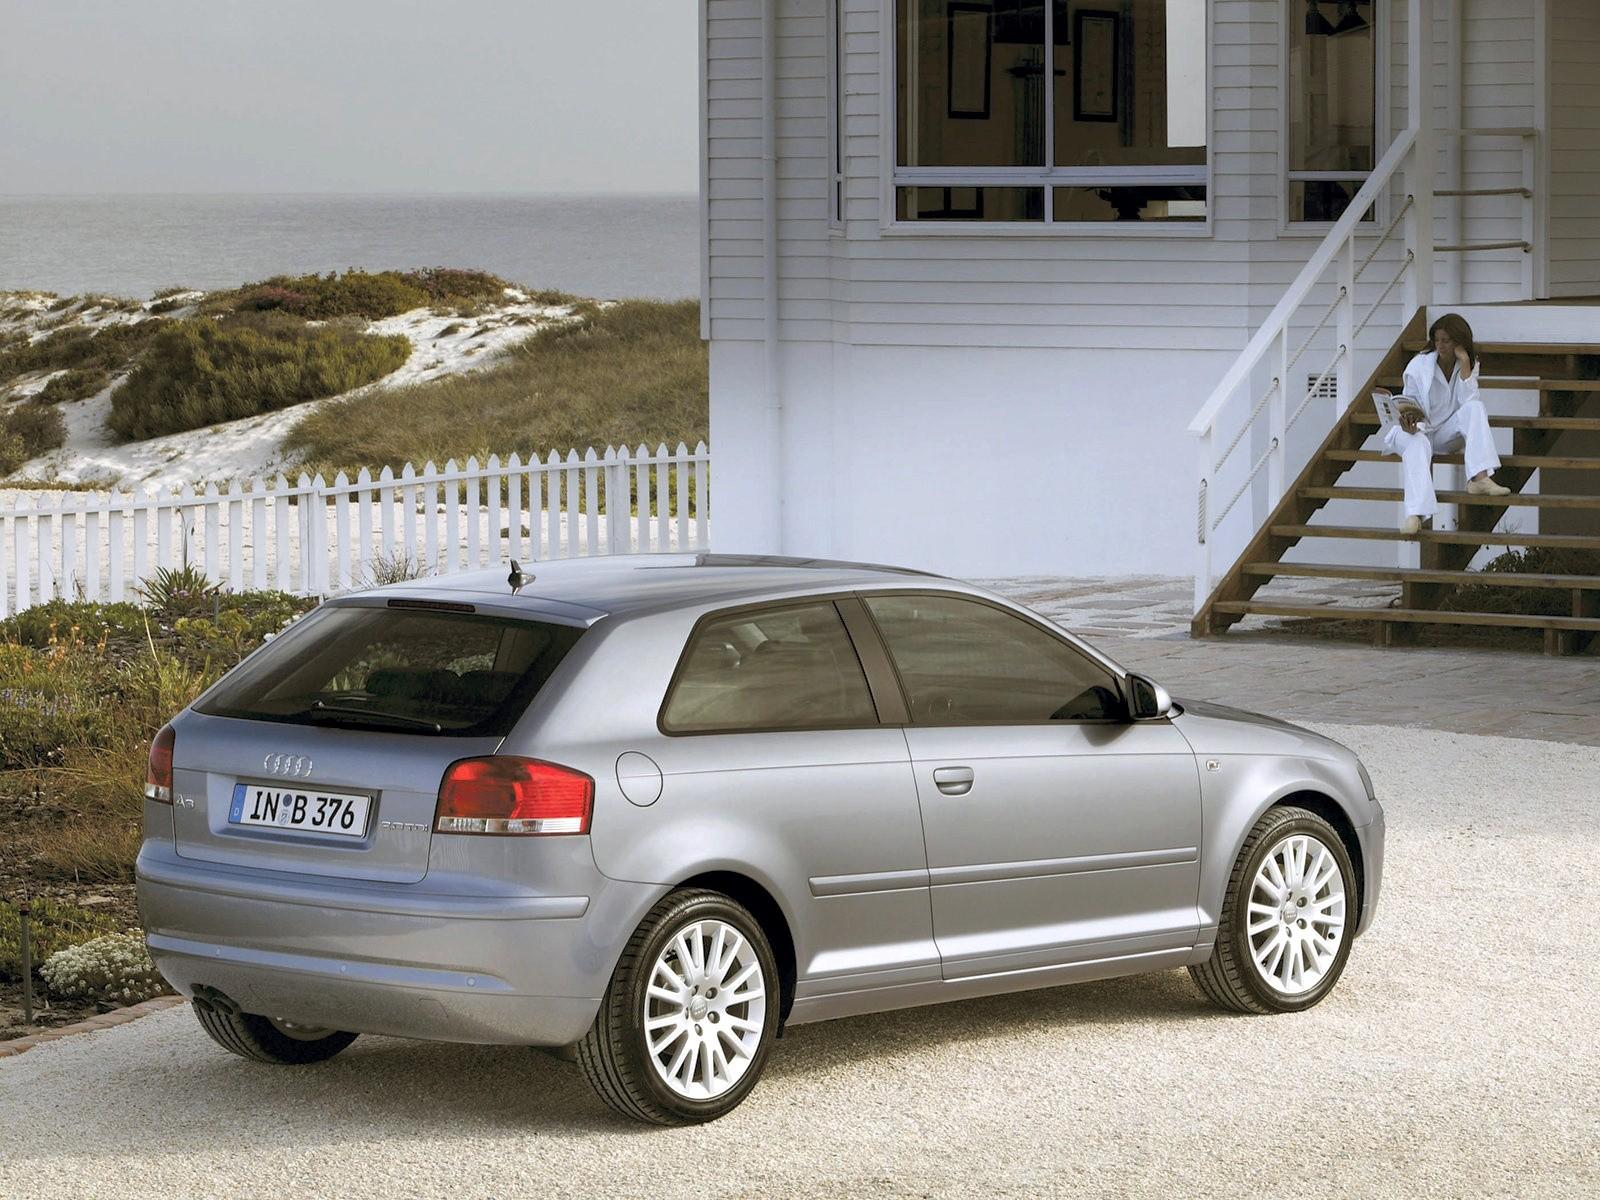 Audi A3 2008 >> AUDI A3 - 2005, 2006, 2007, 2008 - autoevolution